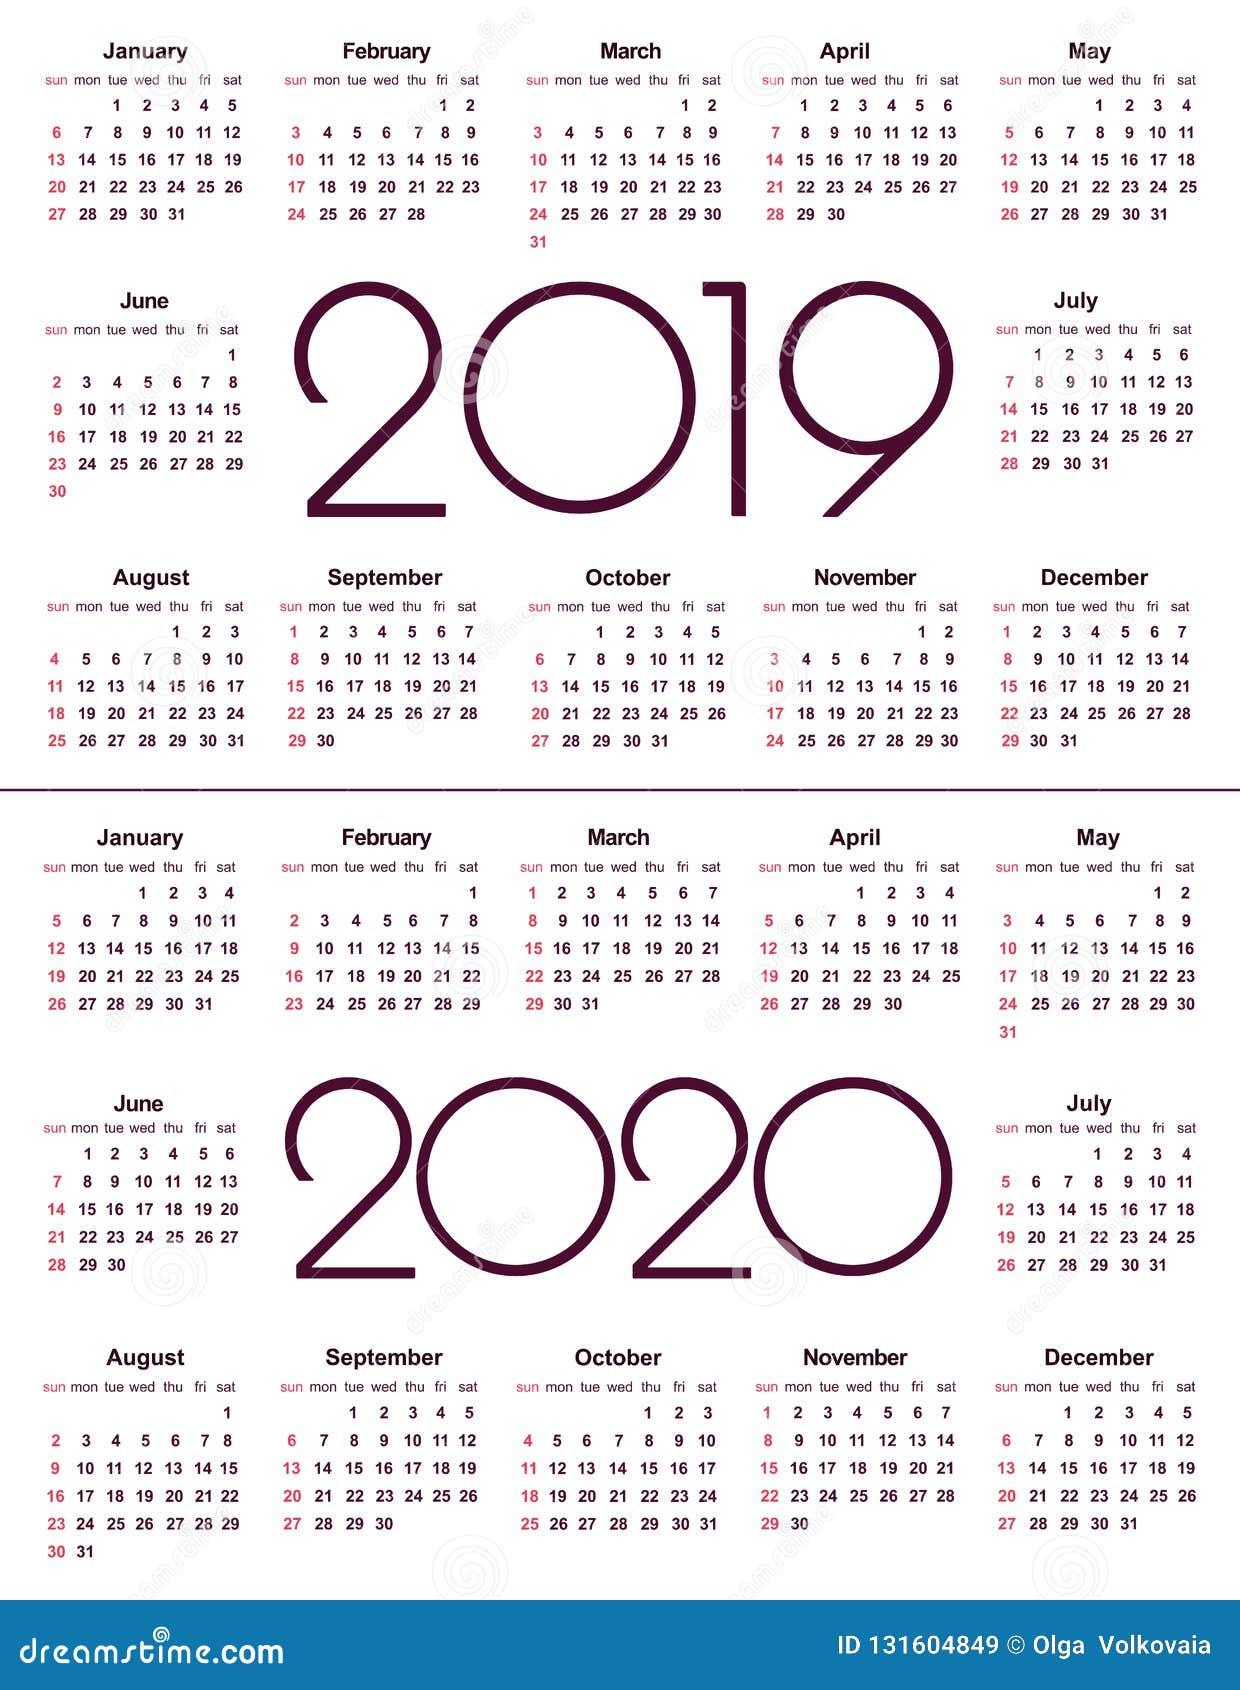 Calendario 2019 2020.Calendar 2019 And 2020 Year Simple Vector Template Stationery